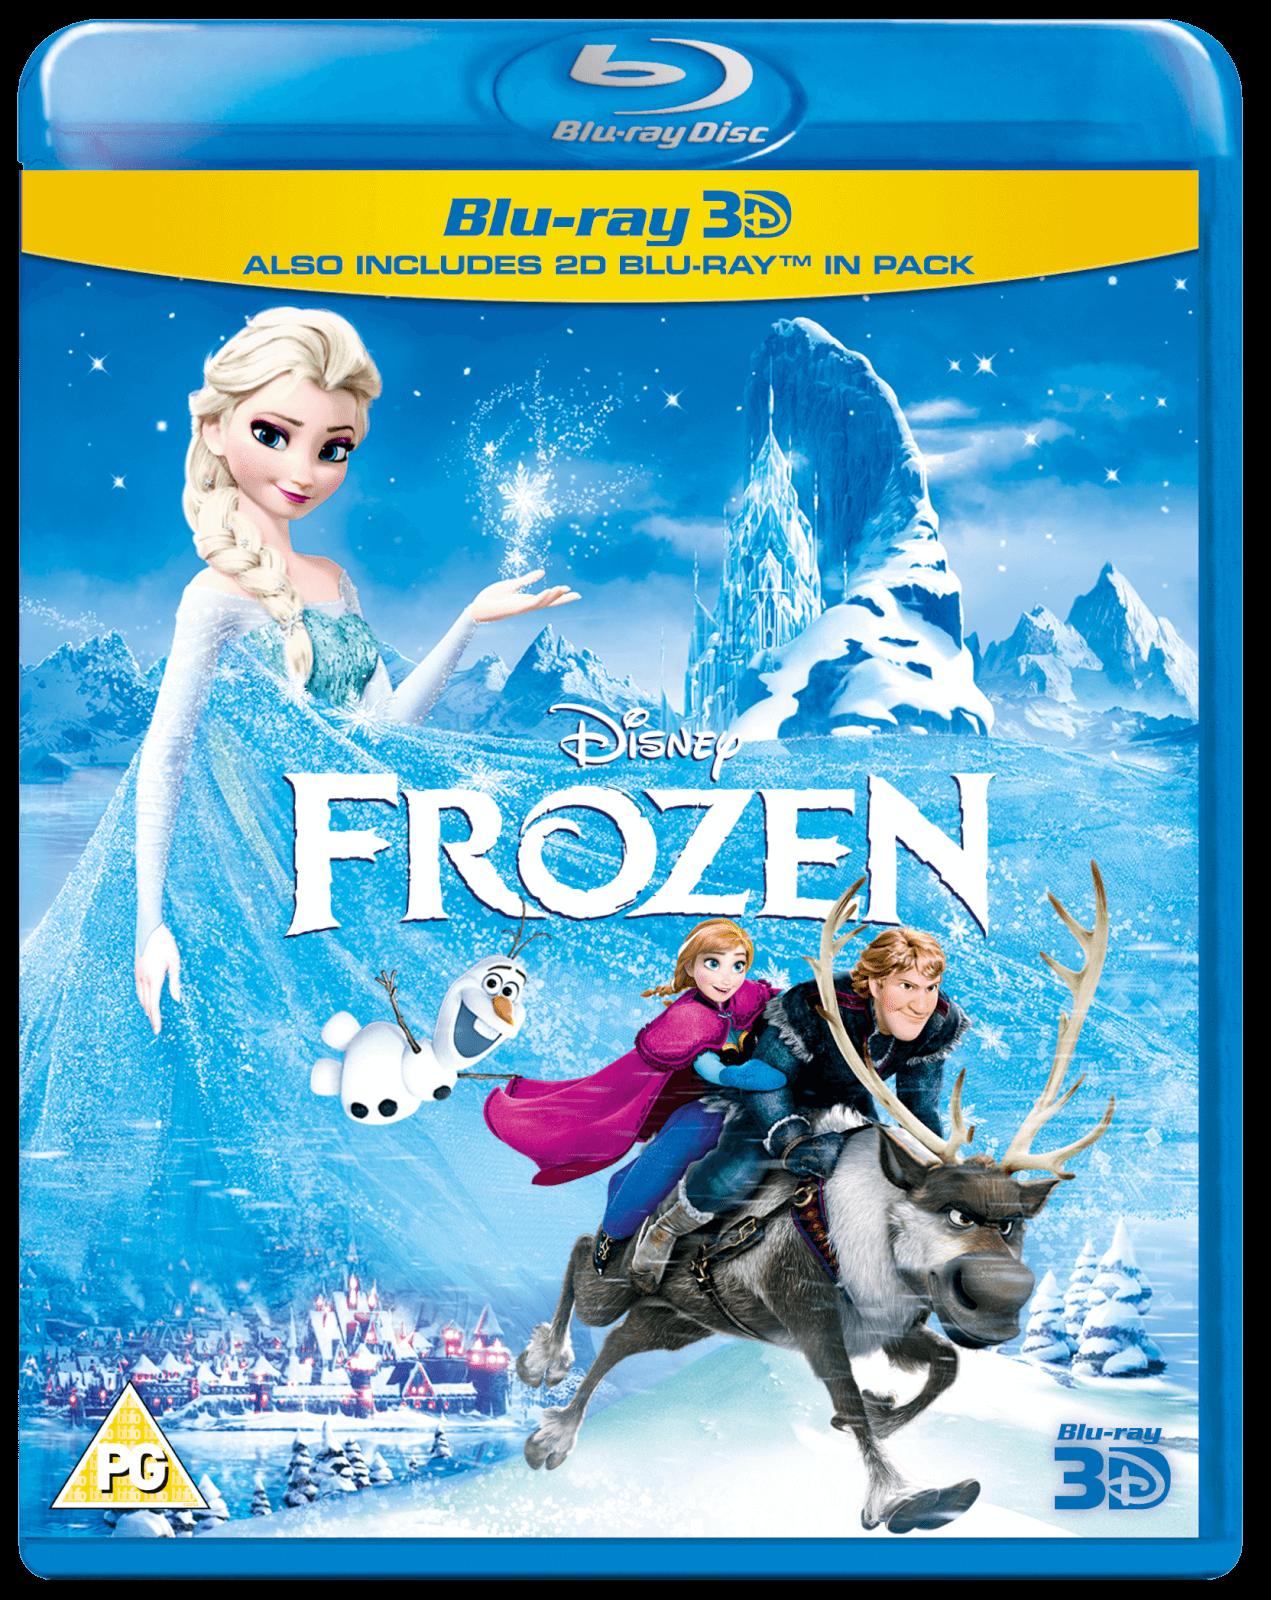 Disney 3D Region Free Blu-ray Movies: Frozen, Big Hero 6